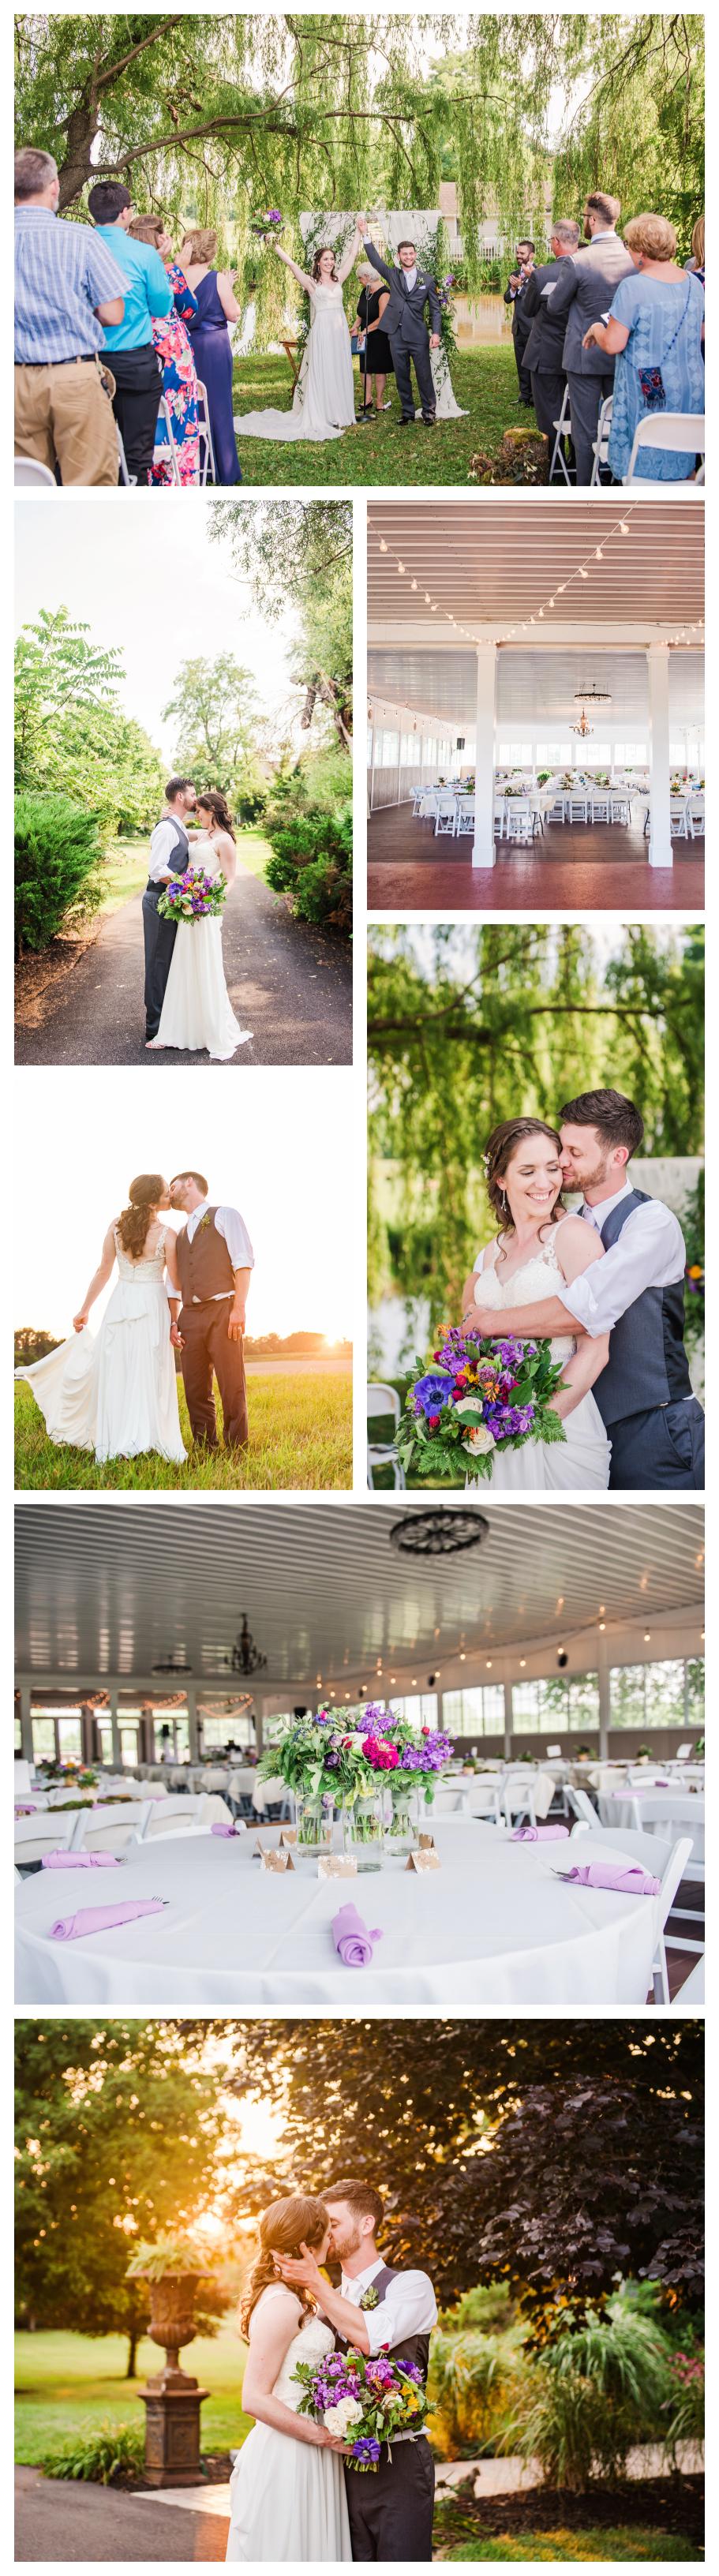 Jerris_Wadsworth_Rochester_Wedding_JILL_STUDIO_1.jpg